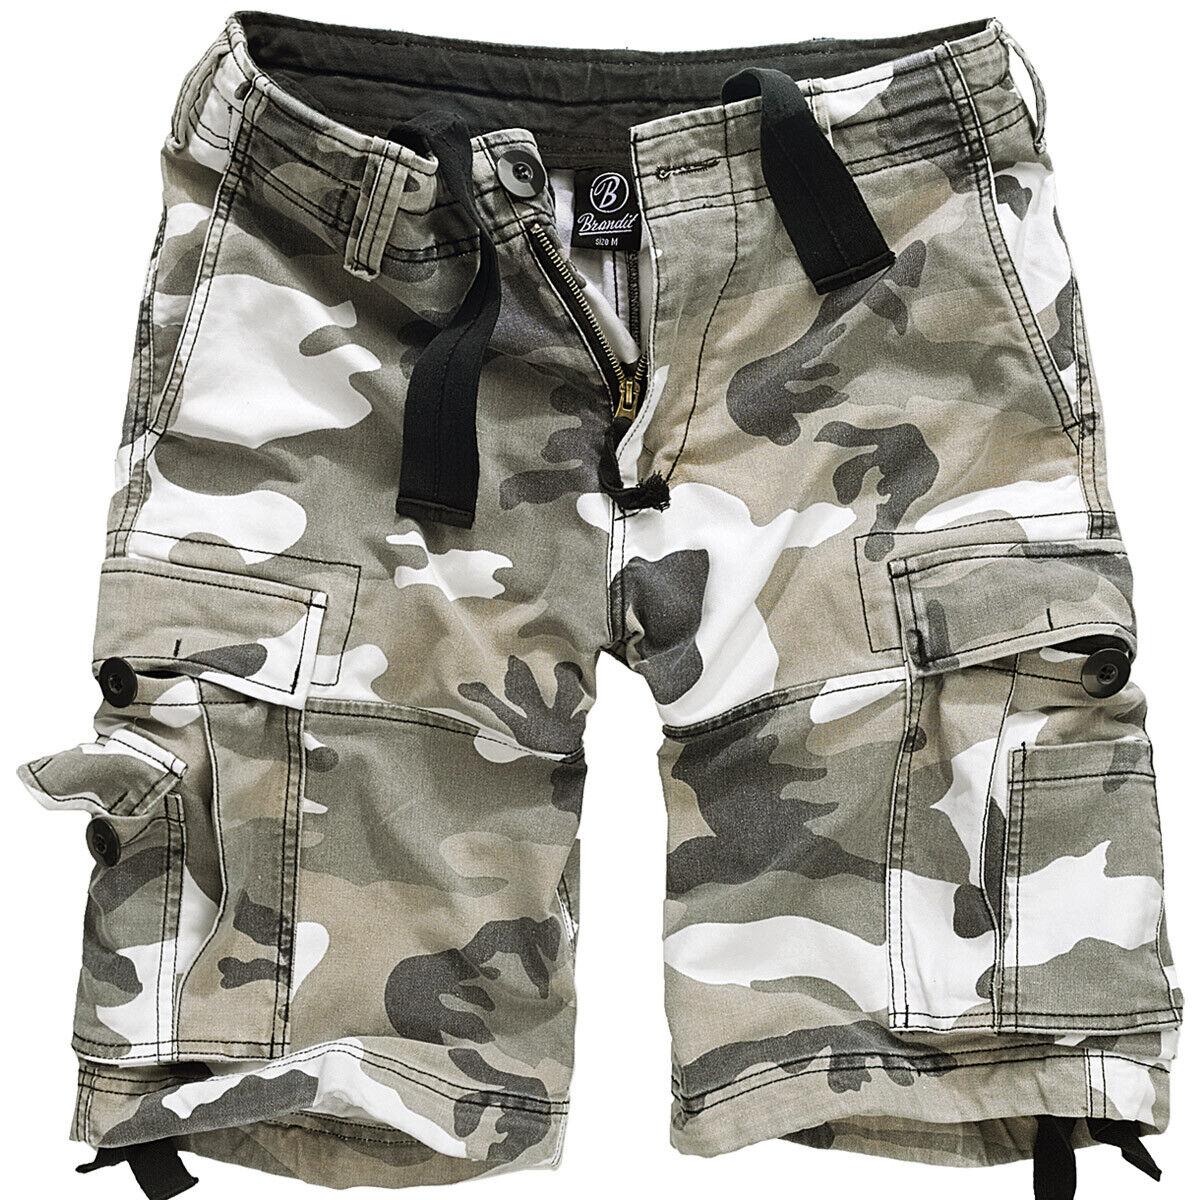 Brandit Vintage Classic Mens Army Military Cargo Combat Shorts Cotton Urban Camo